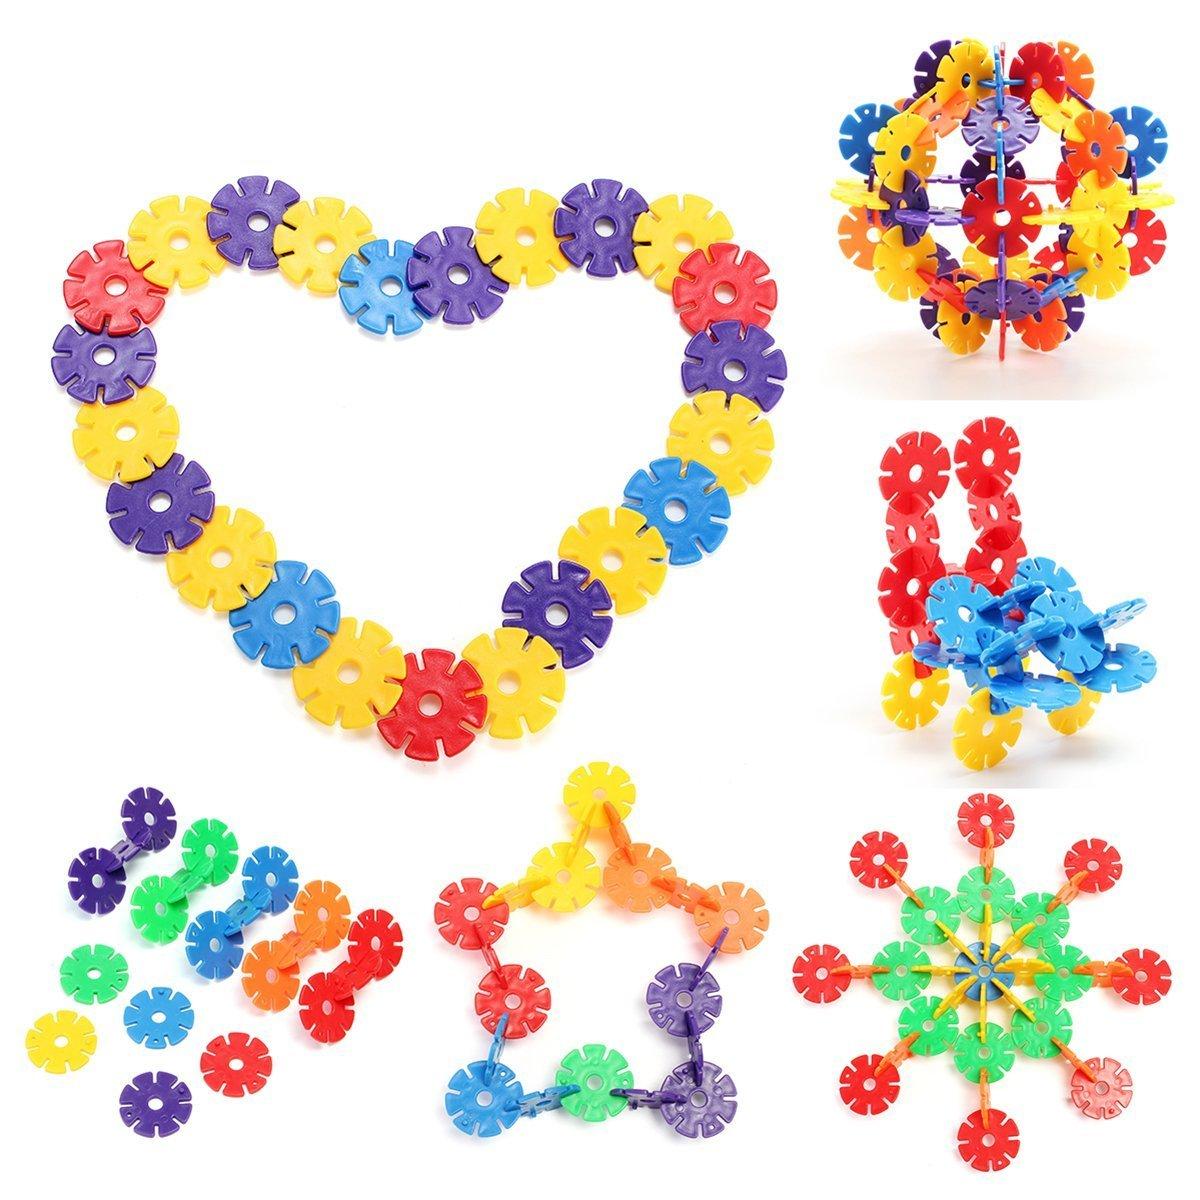 2 Atglus 500pcs Snowflakes Building Blocks Plastic Insert Assembly Block Sets for Baby Child Educational DIY Toys